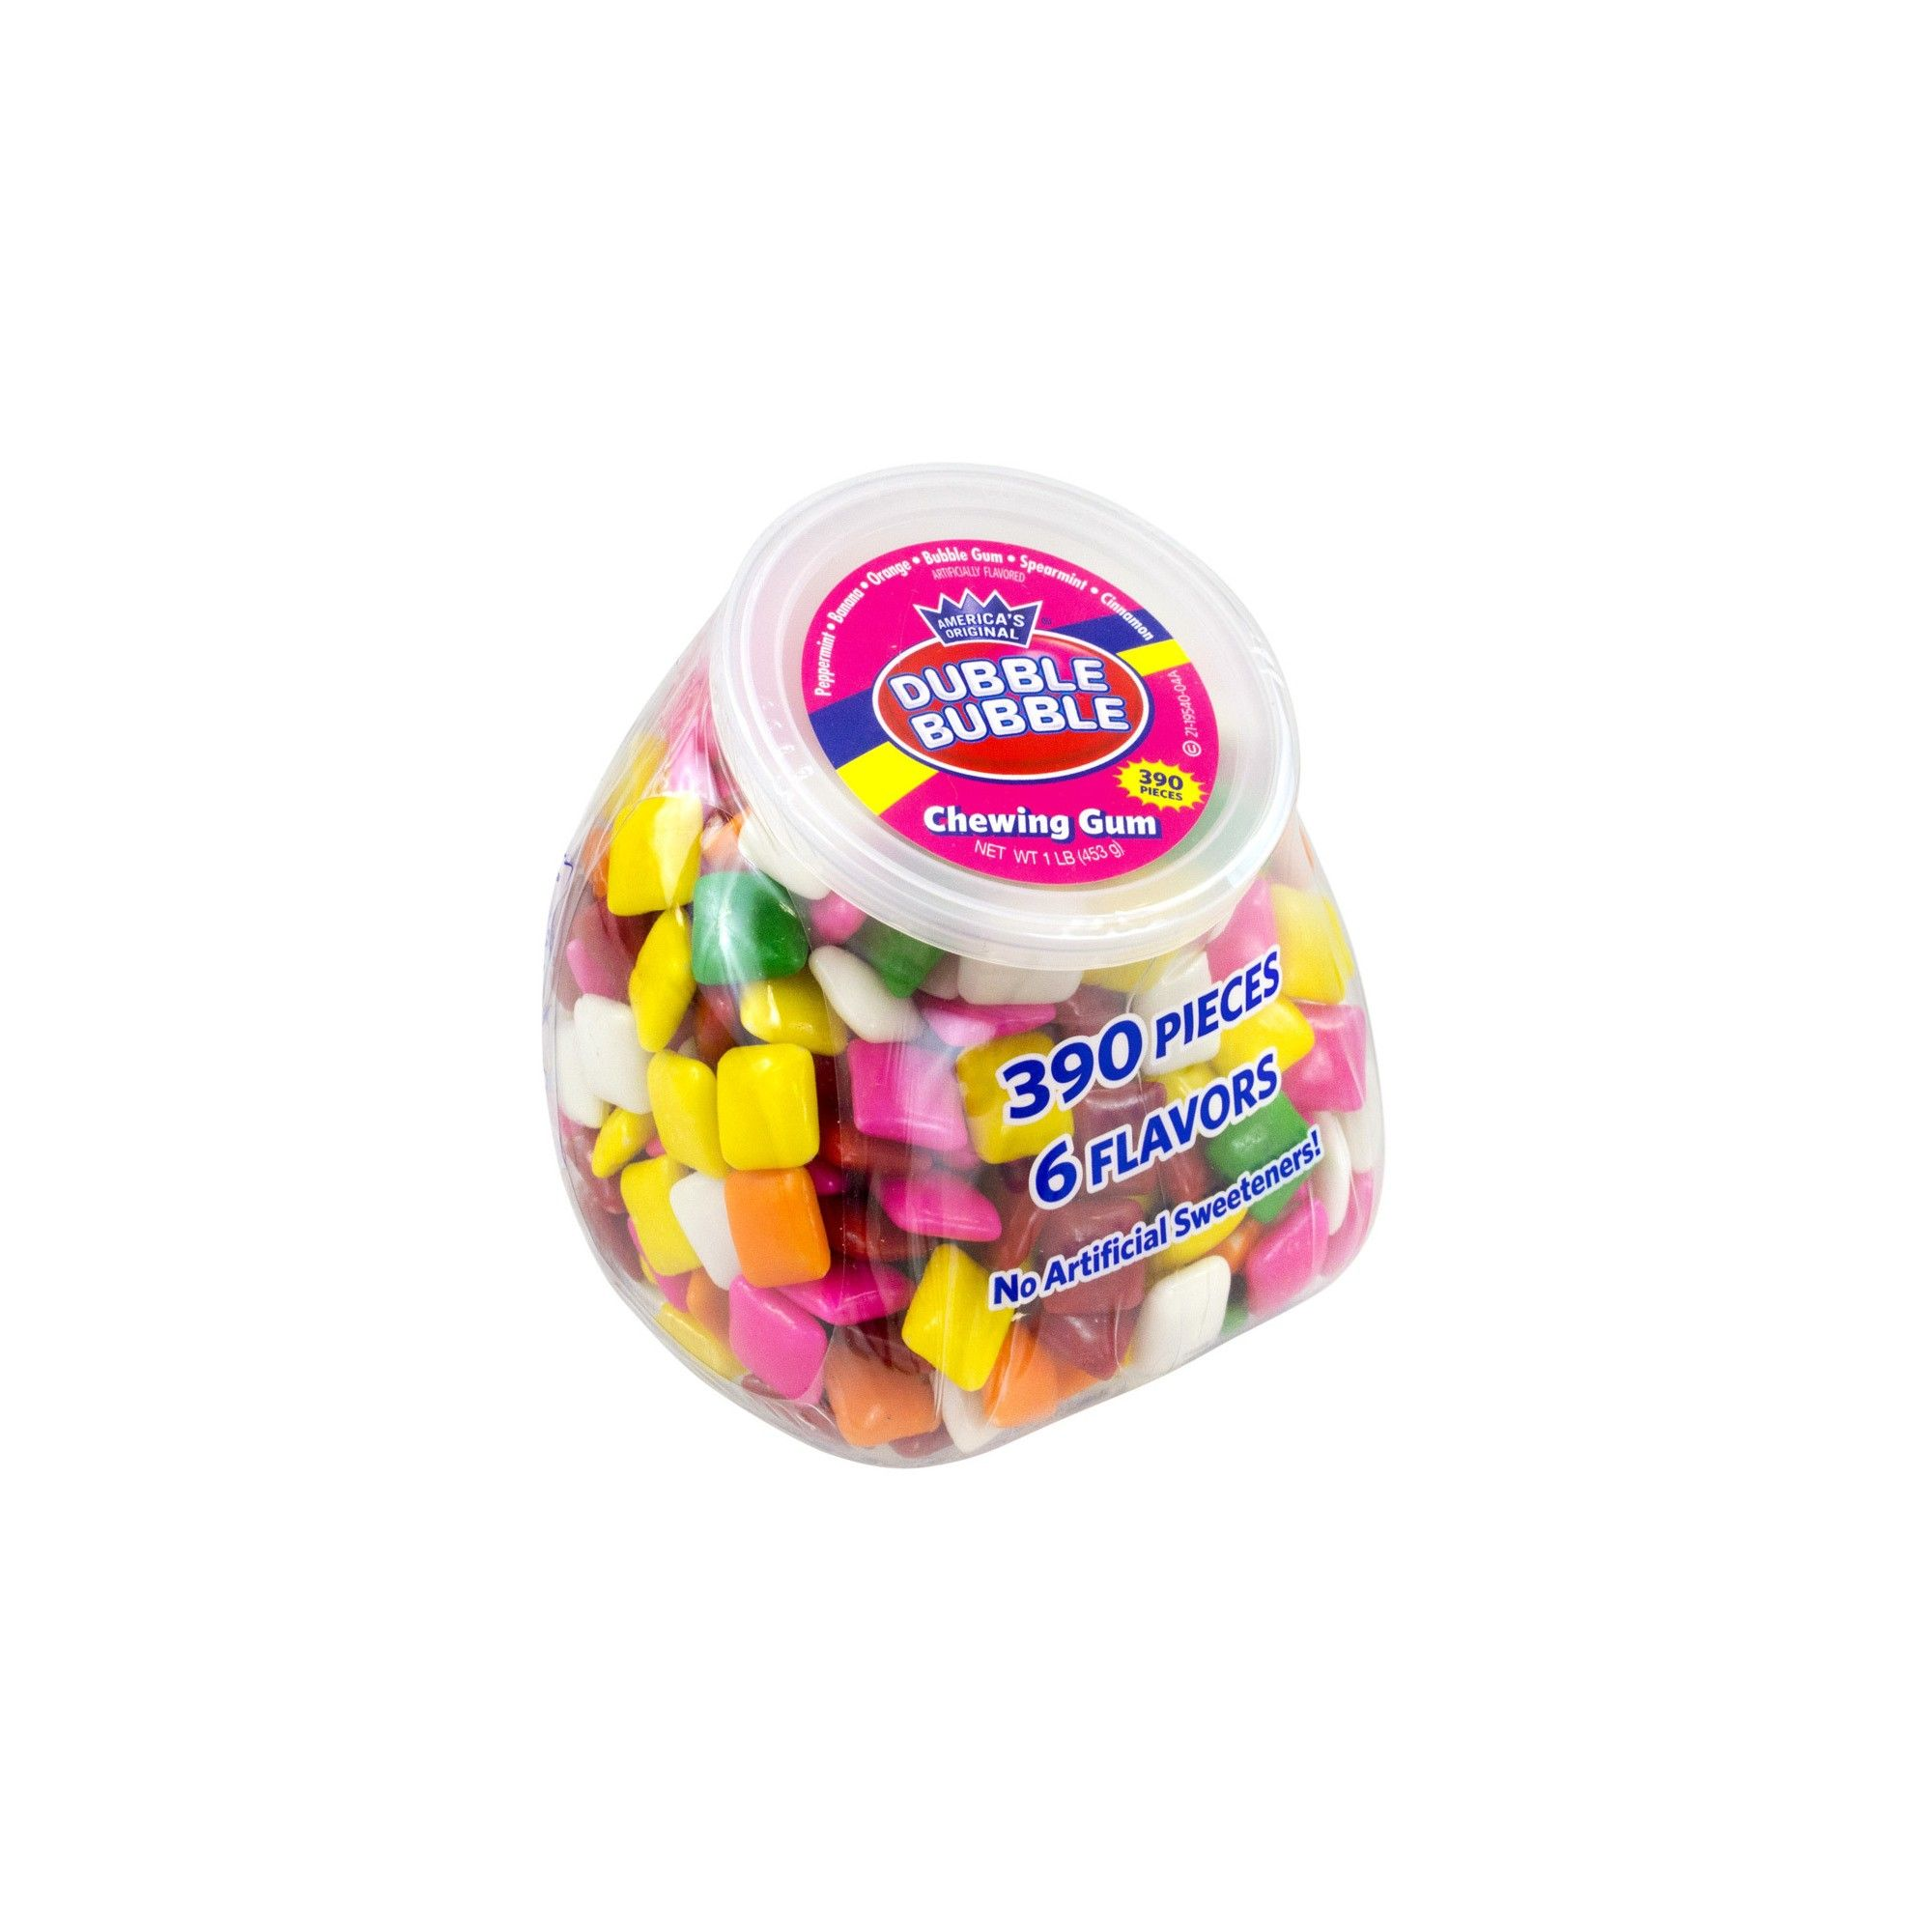 Dubble Bubble Chewing Gum Office Pleasures Tub - 390ct   Chewing gum ...